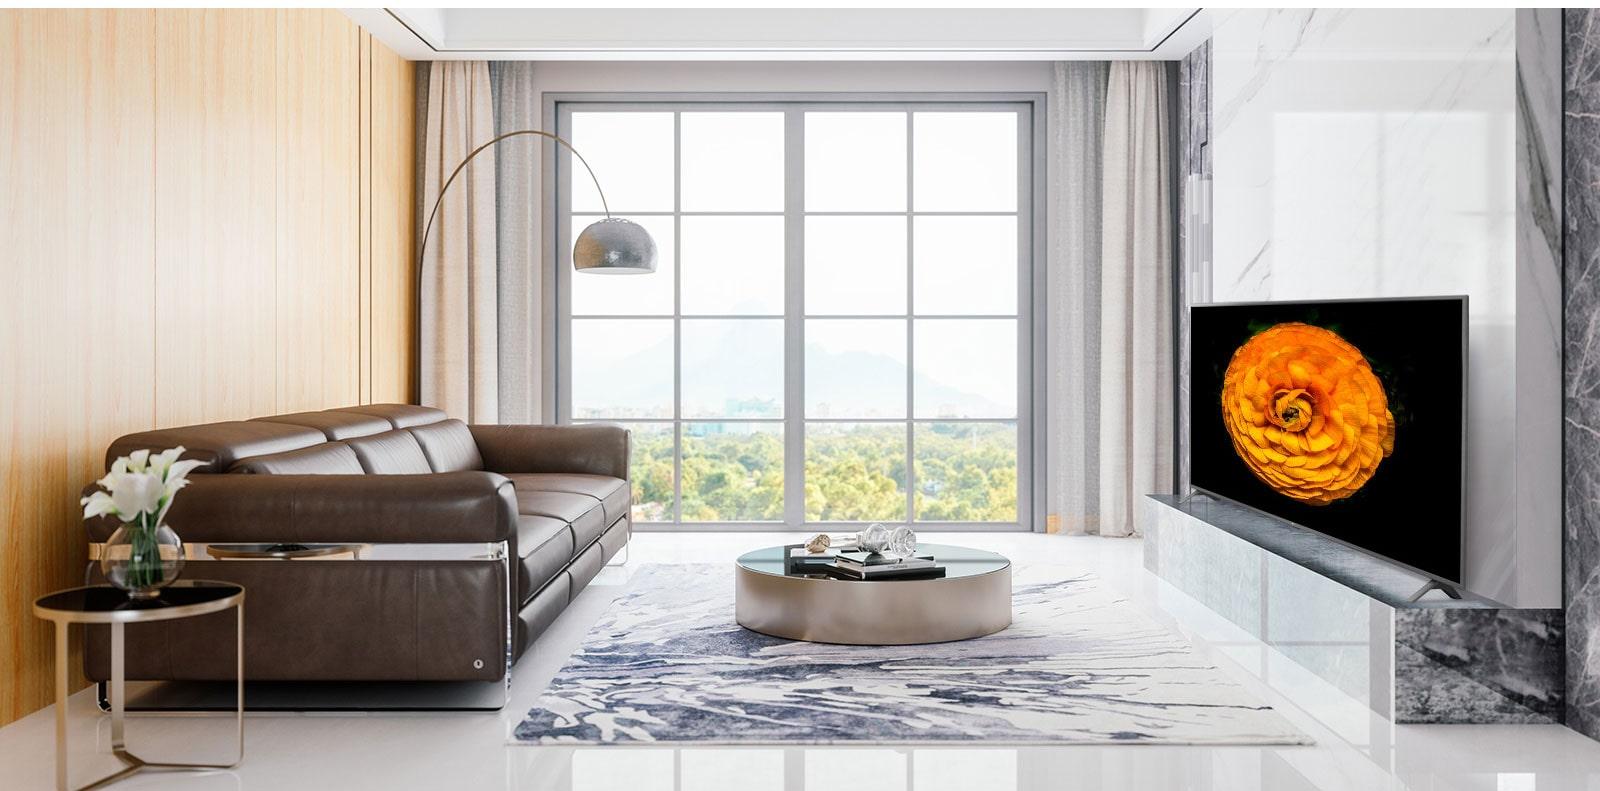 TV UHD LG, terletak pada dinding ruang santai dengan interior minimal. Layar TV menampilkan gambar bunga.